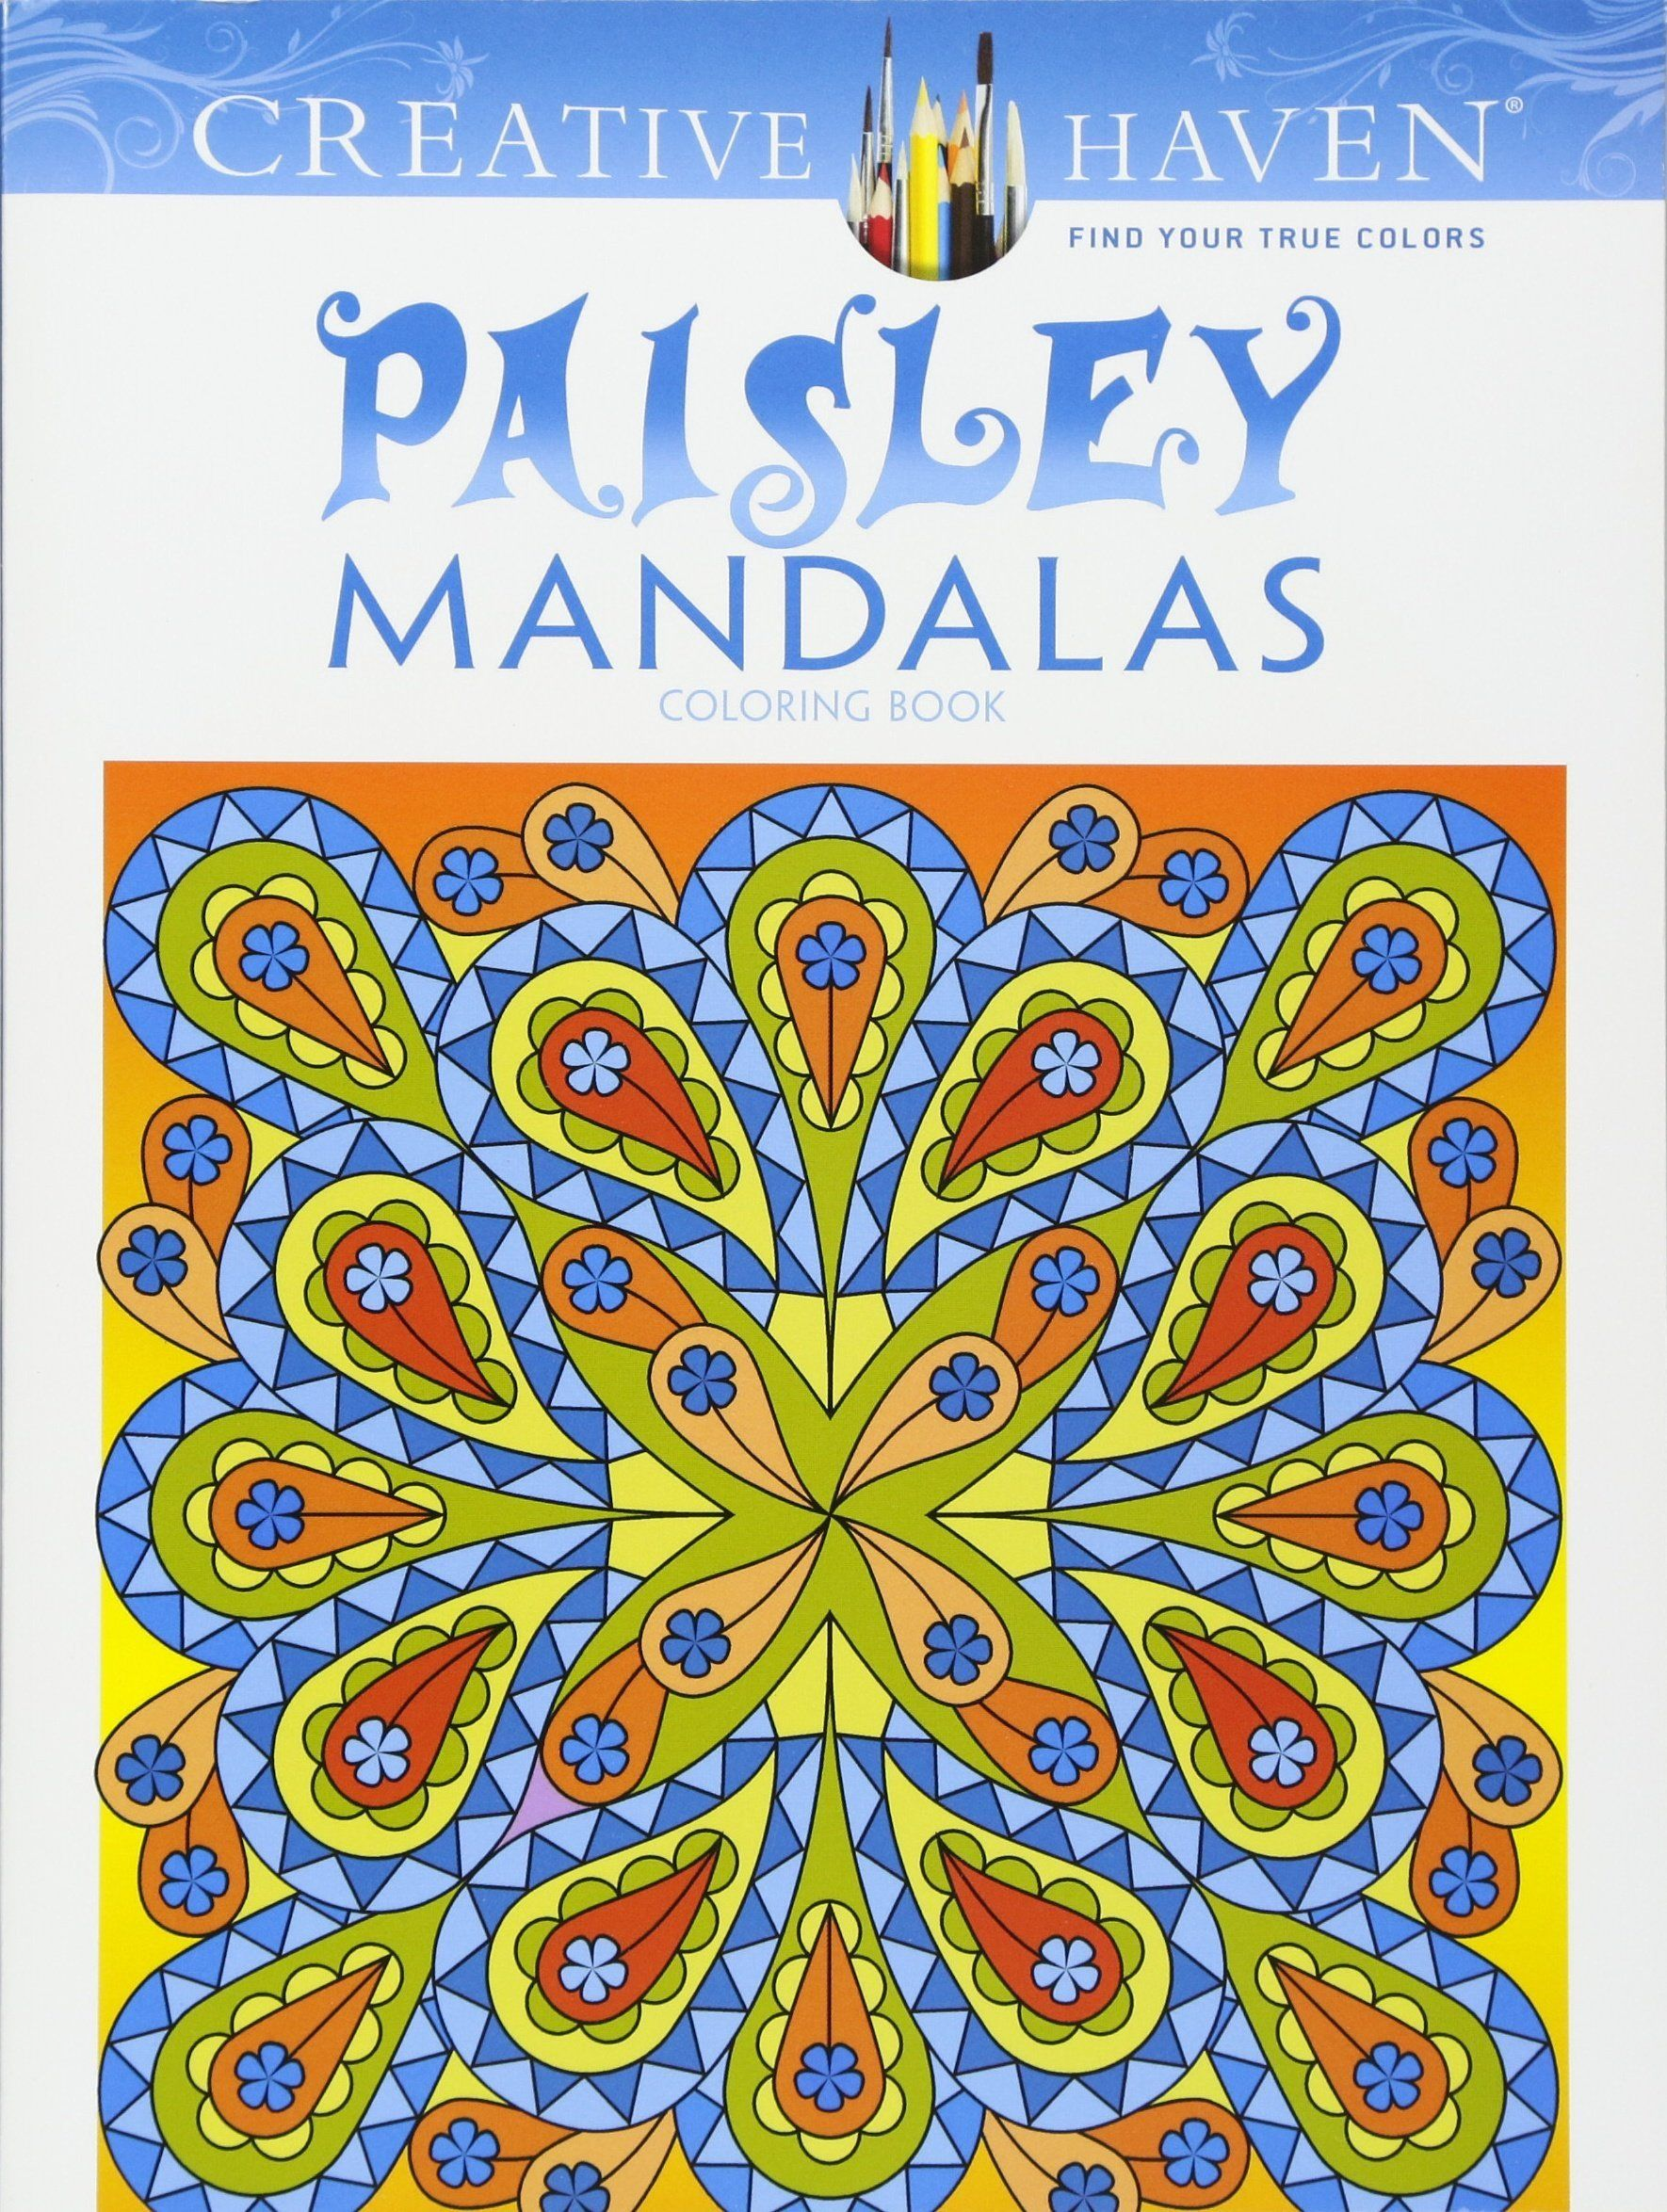 Paisley Mandalas Coloring Book Creative Haven Books CSM